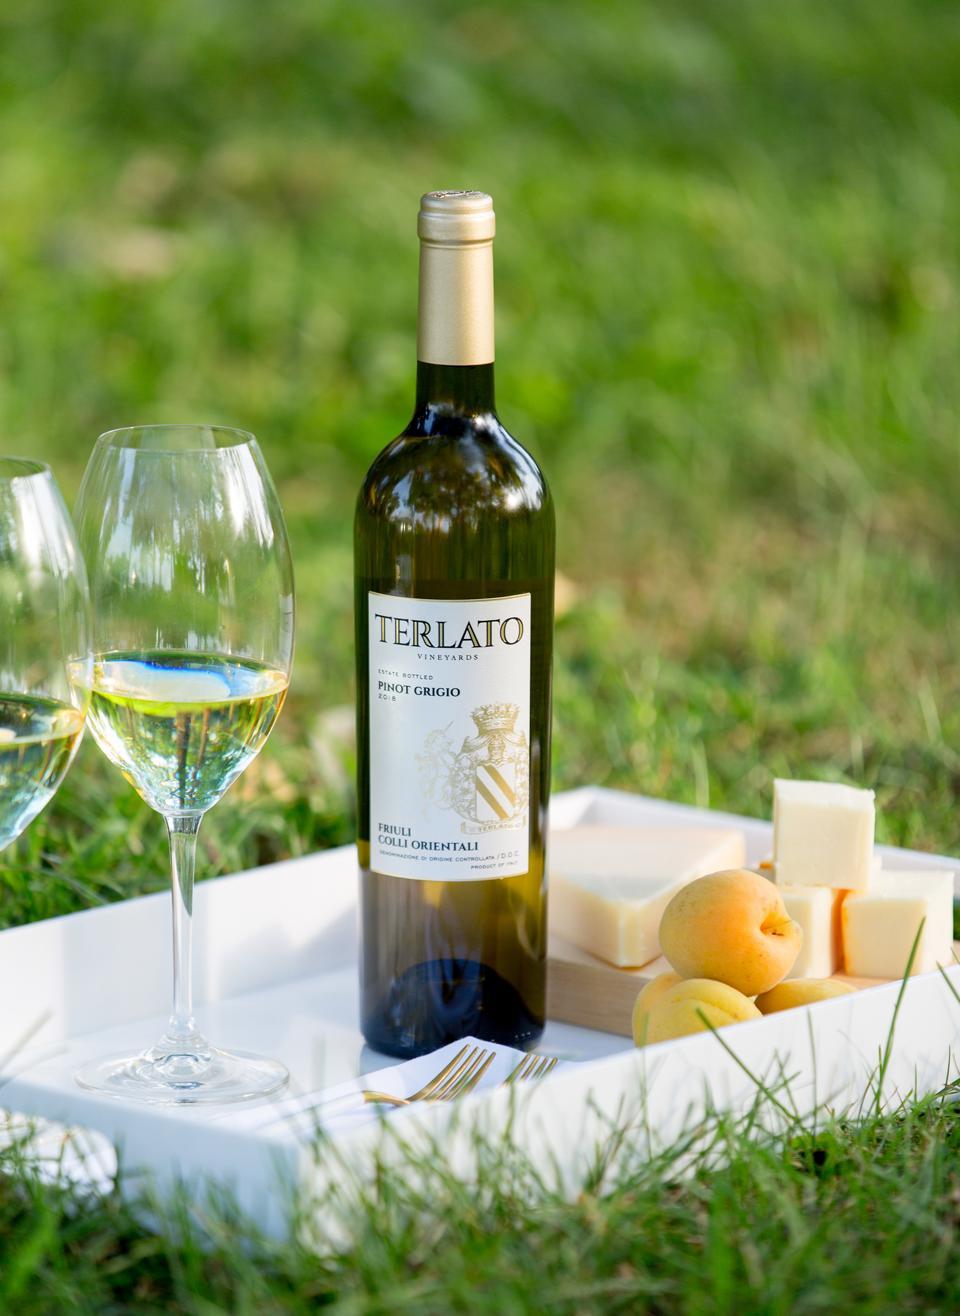 Terlato's Pinot Grigio.